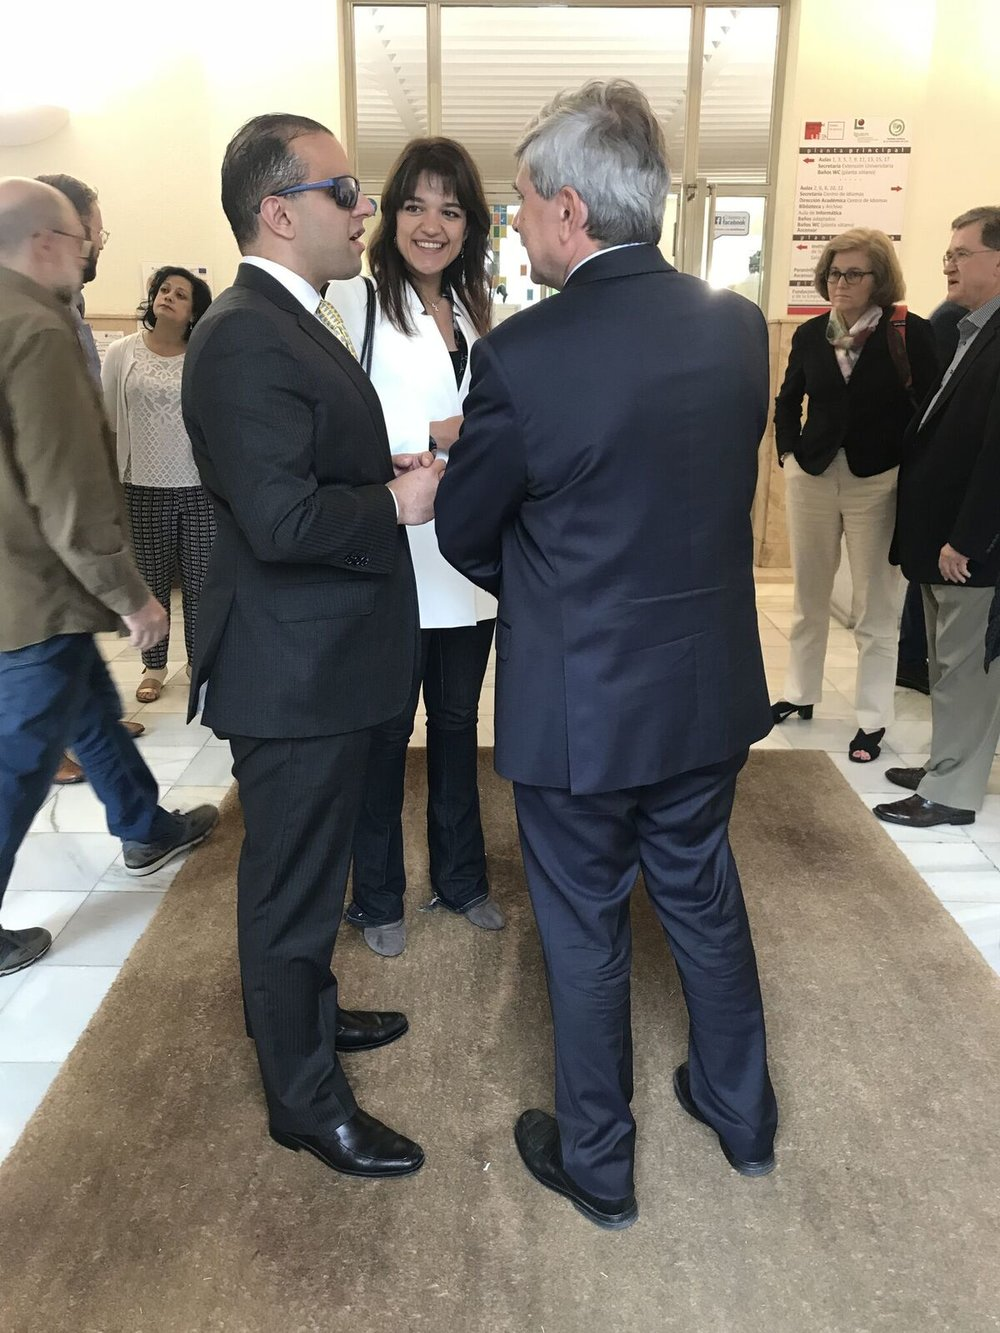 Meeting with President of the University of León, Juan Francisco García Marín